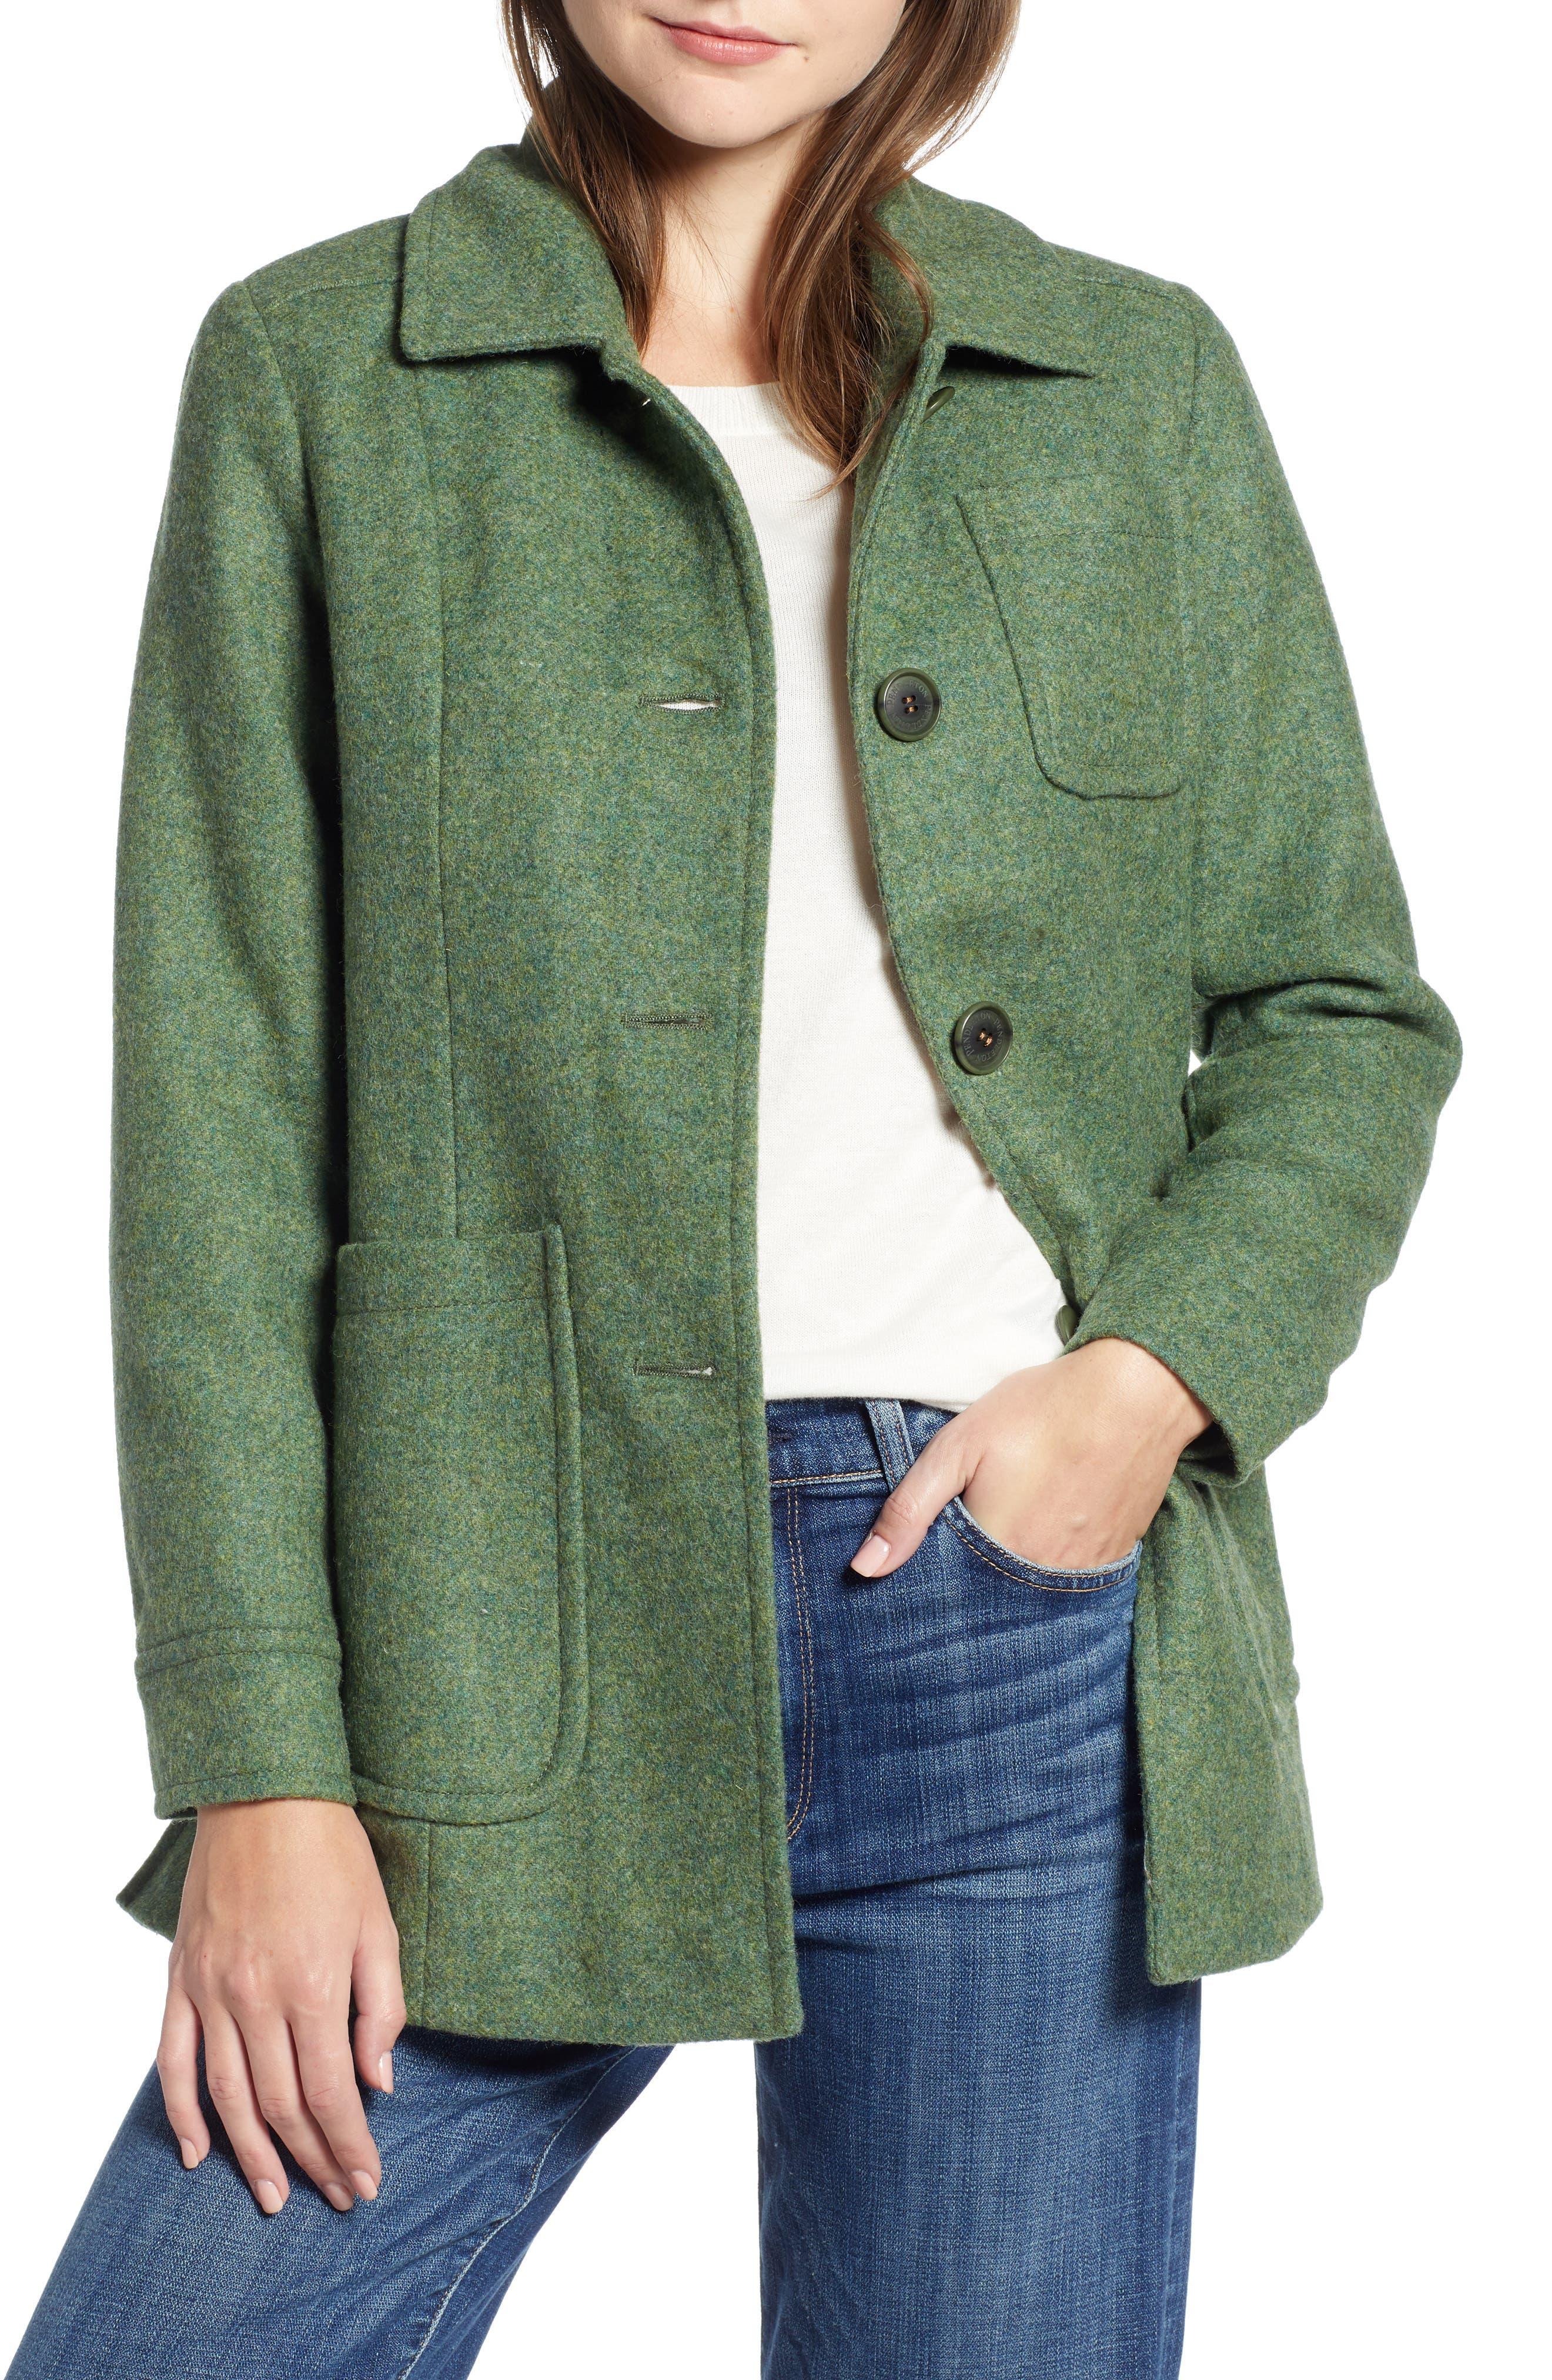 1940s Style Coats and Jackets for Sale Womens Pendleton Casper Mel Wool Blend Barn Coat Size 16 - Green $345.00 AT vintagedancer.com